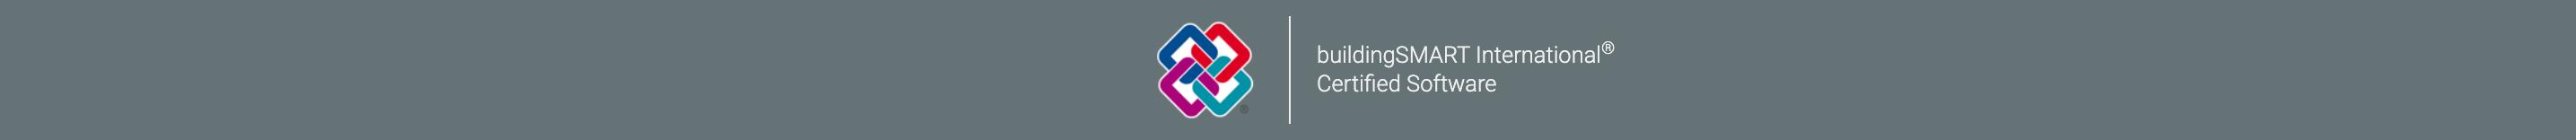 ACCA Software Building Smart Certificate